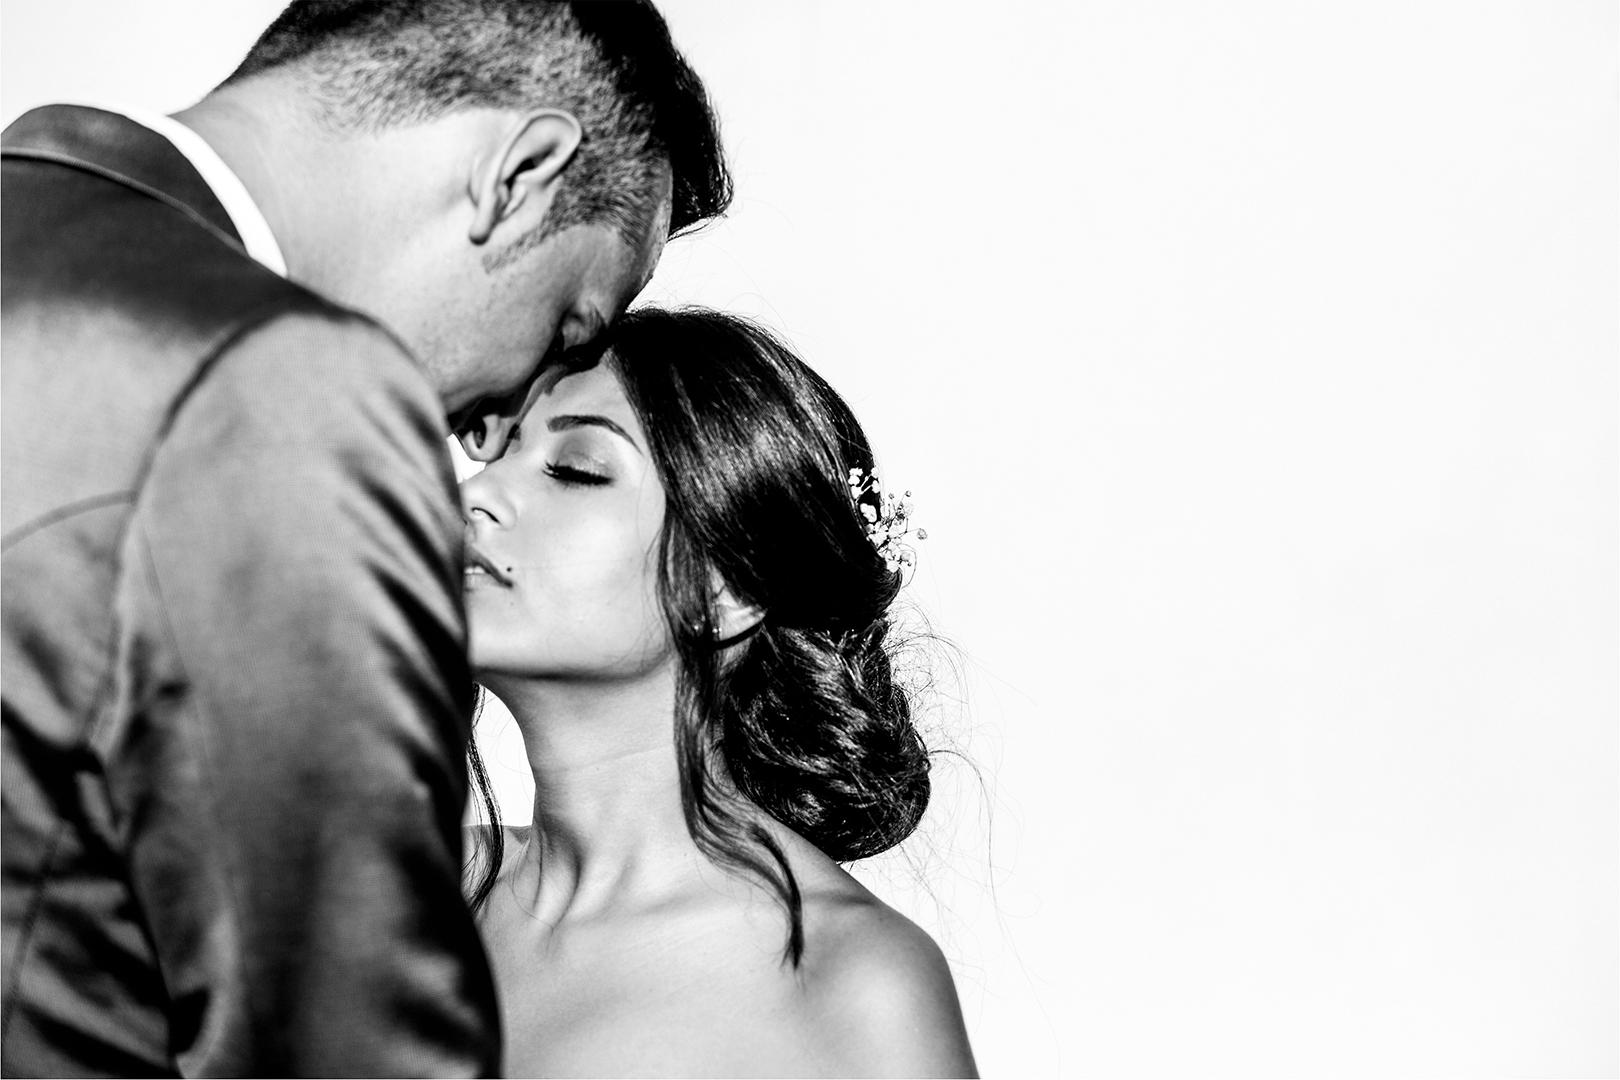 61 gianni-lepore-sposi-bride-groom-primo-piano-fineart-foto-italia-puglia-lucera